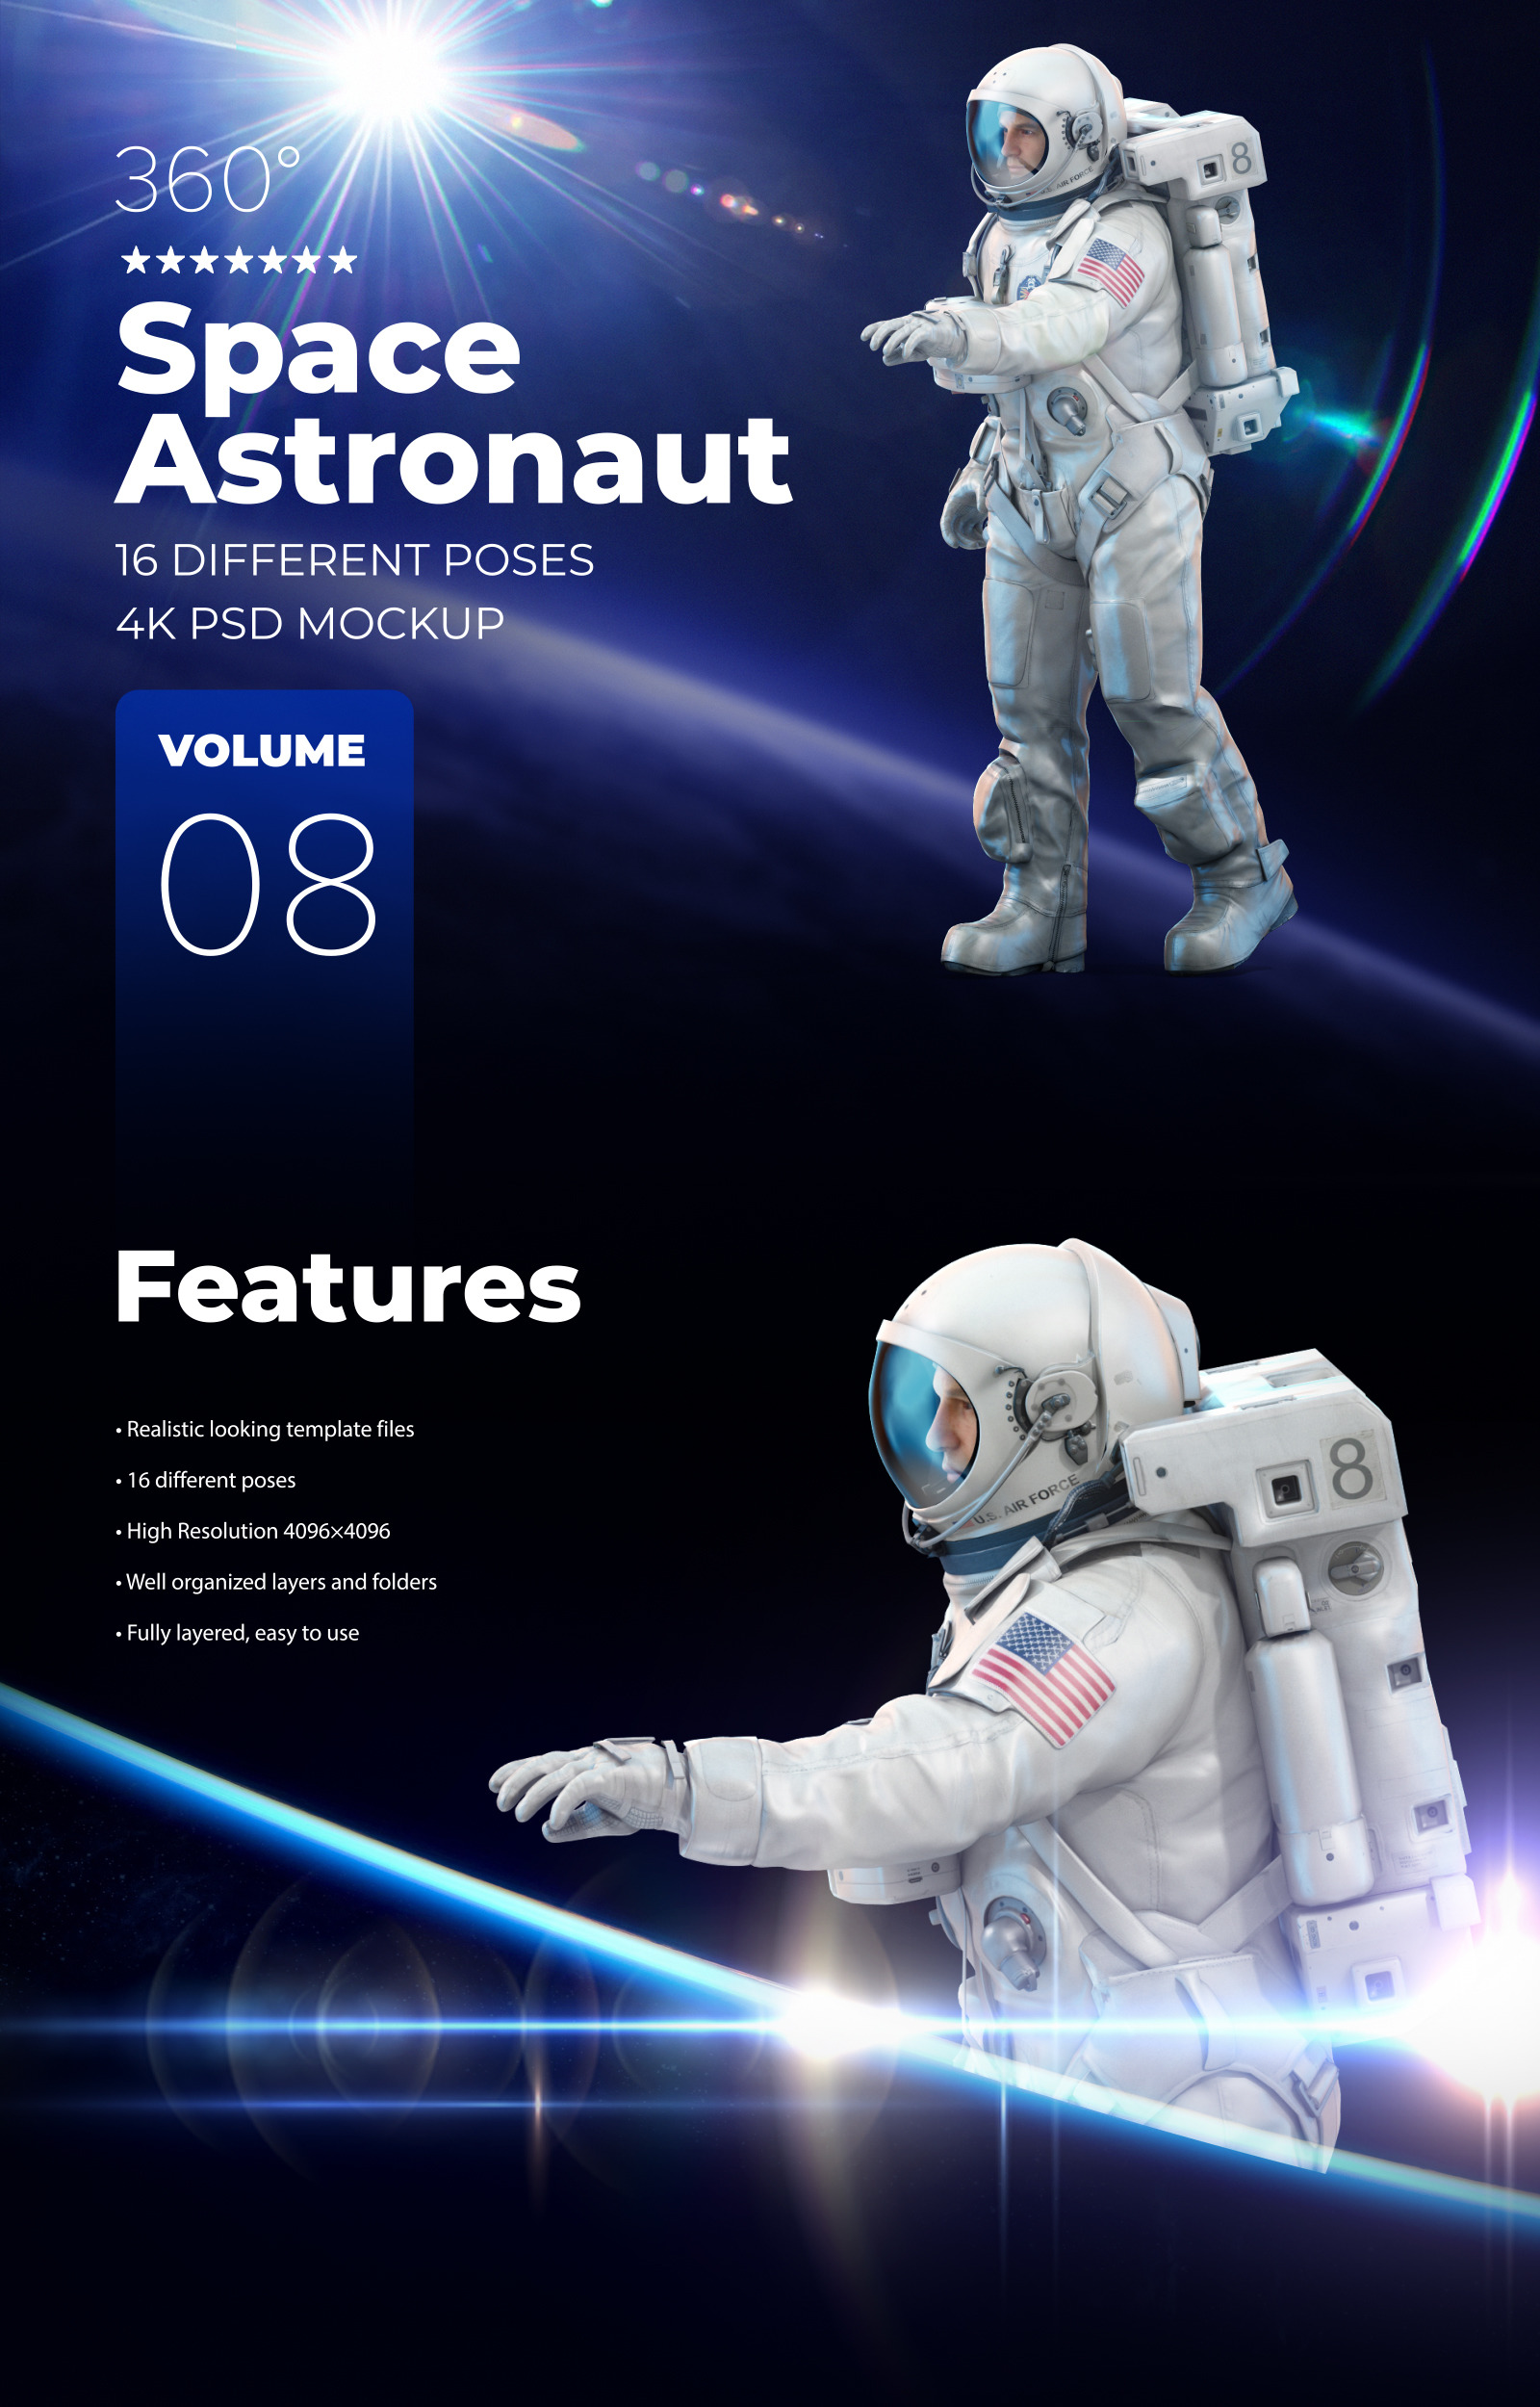 3D Mockup Space Astronaut #08